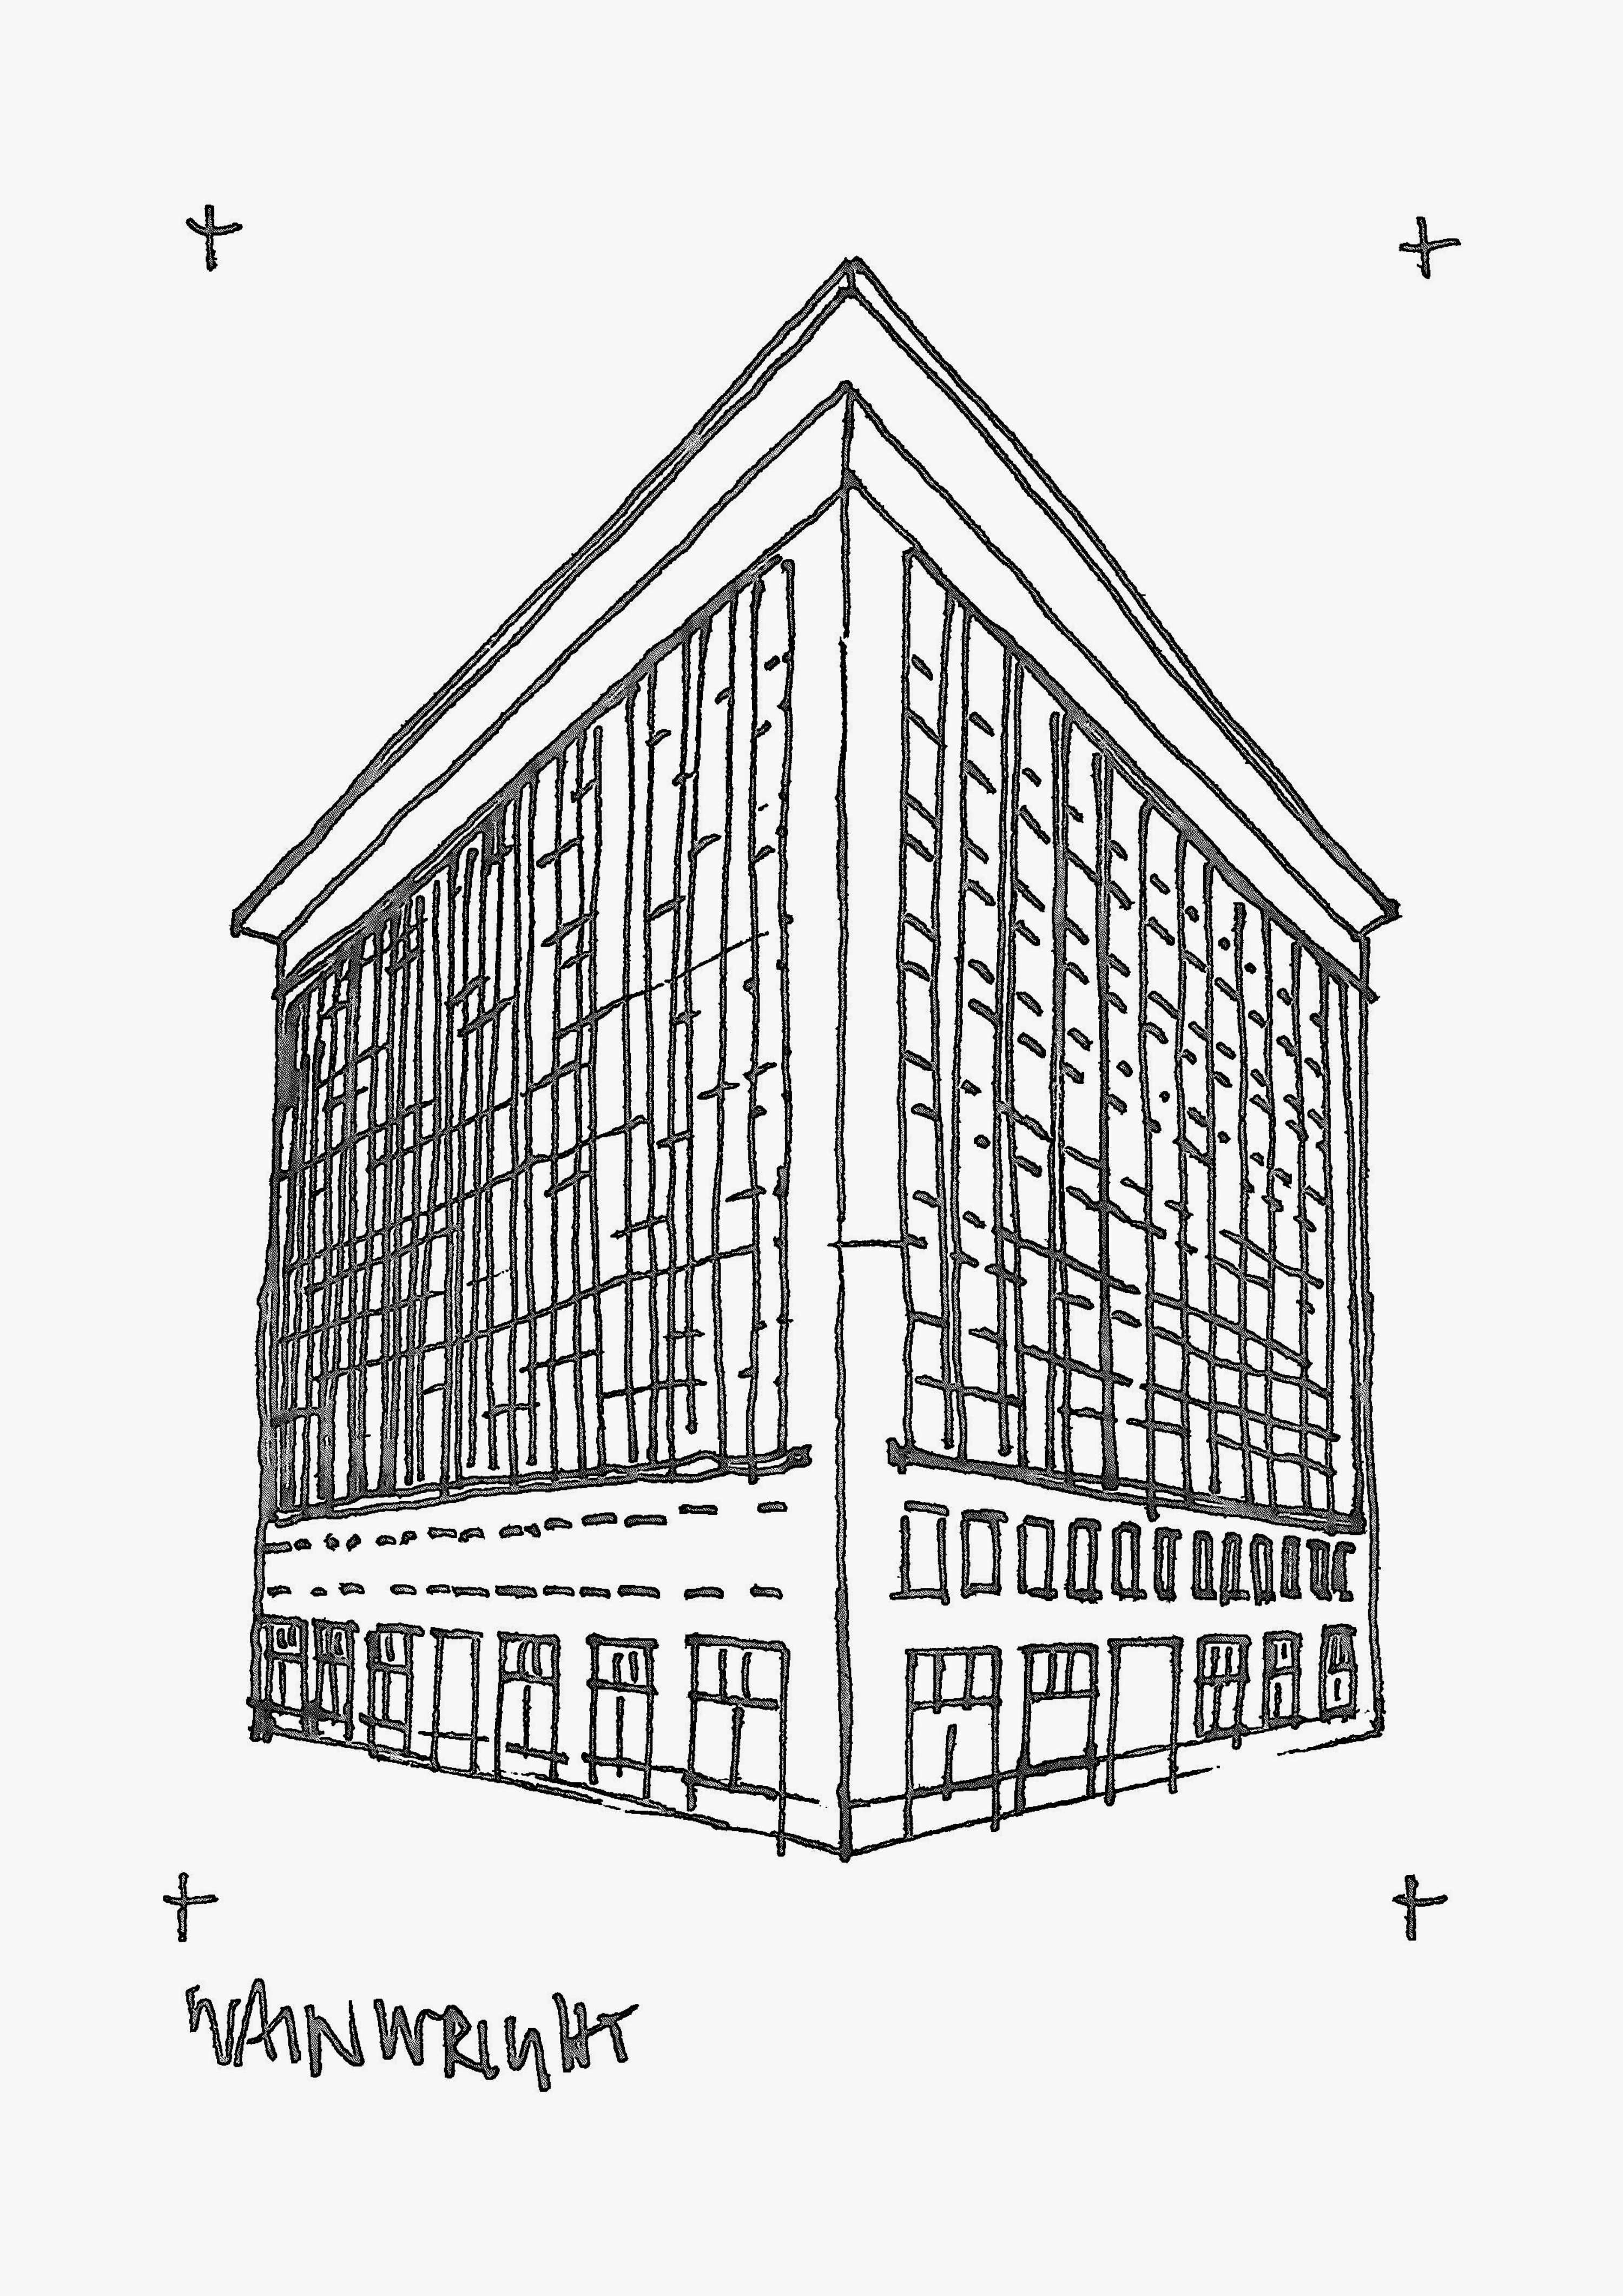 Wainwright Building sketched by Heidi Mergl Architect